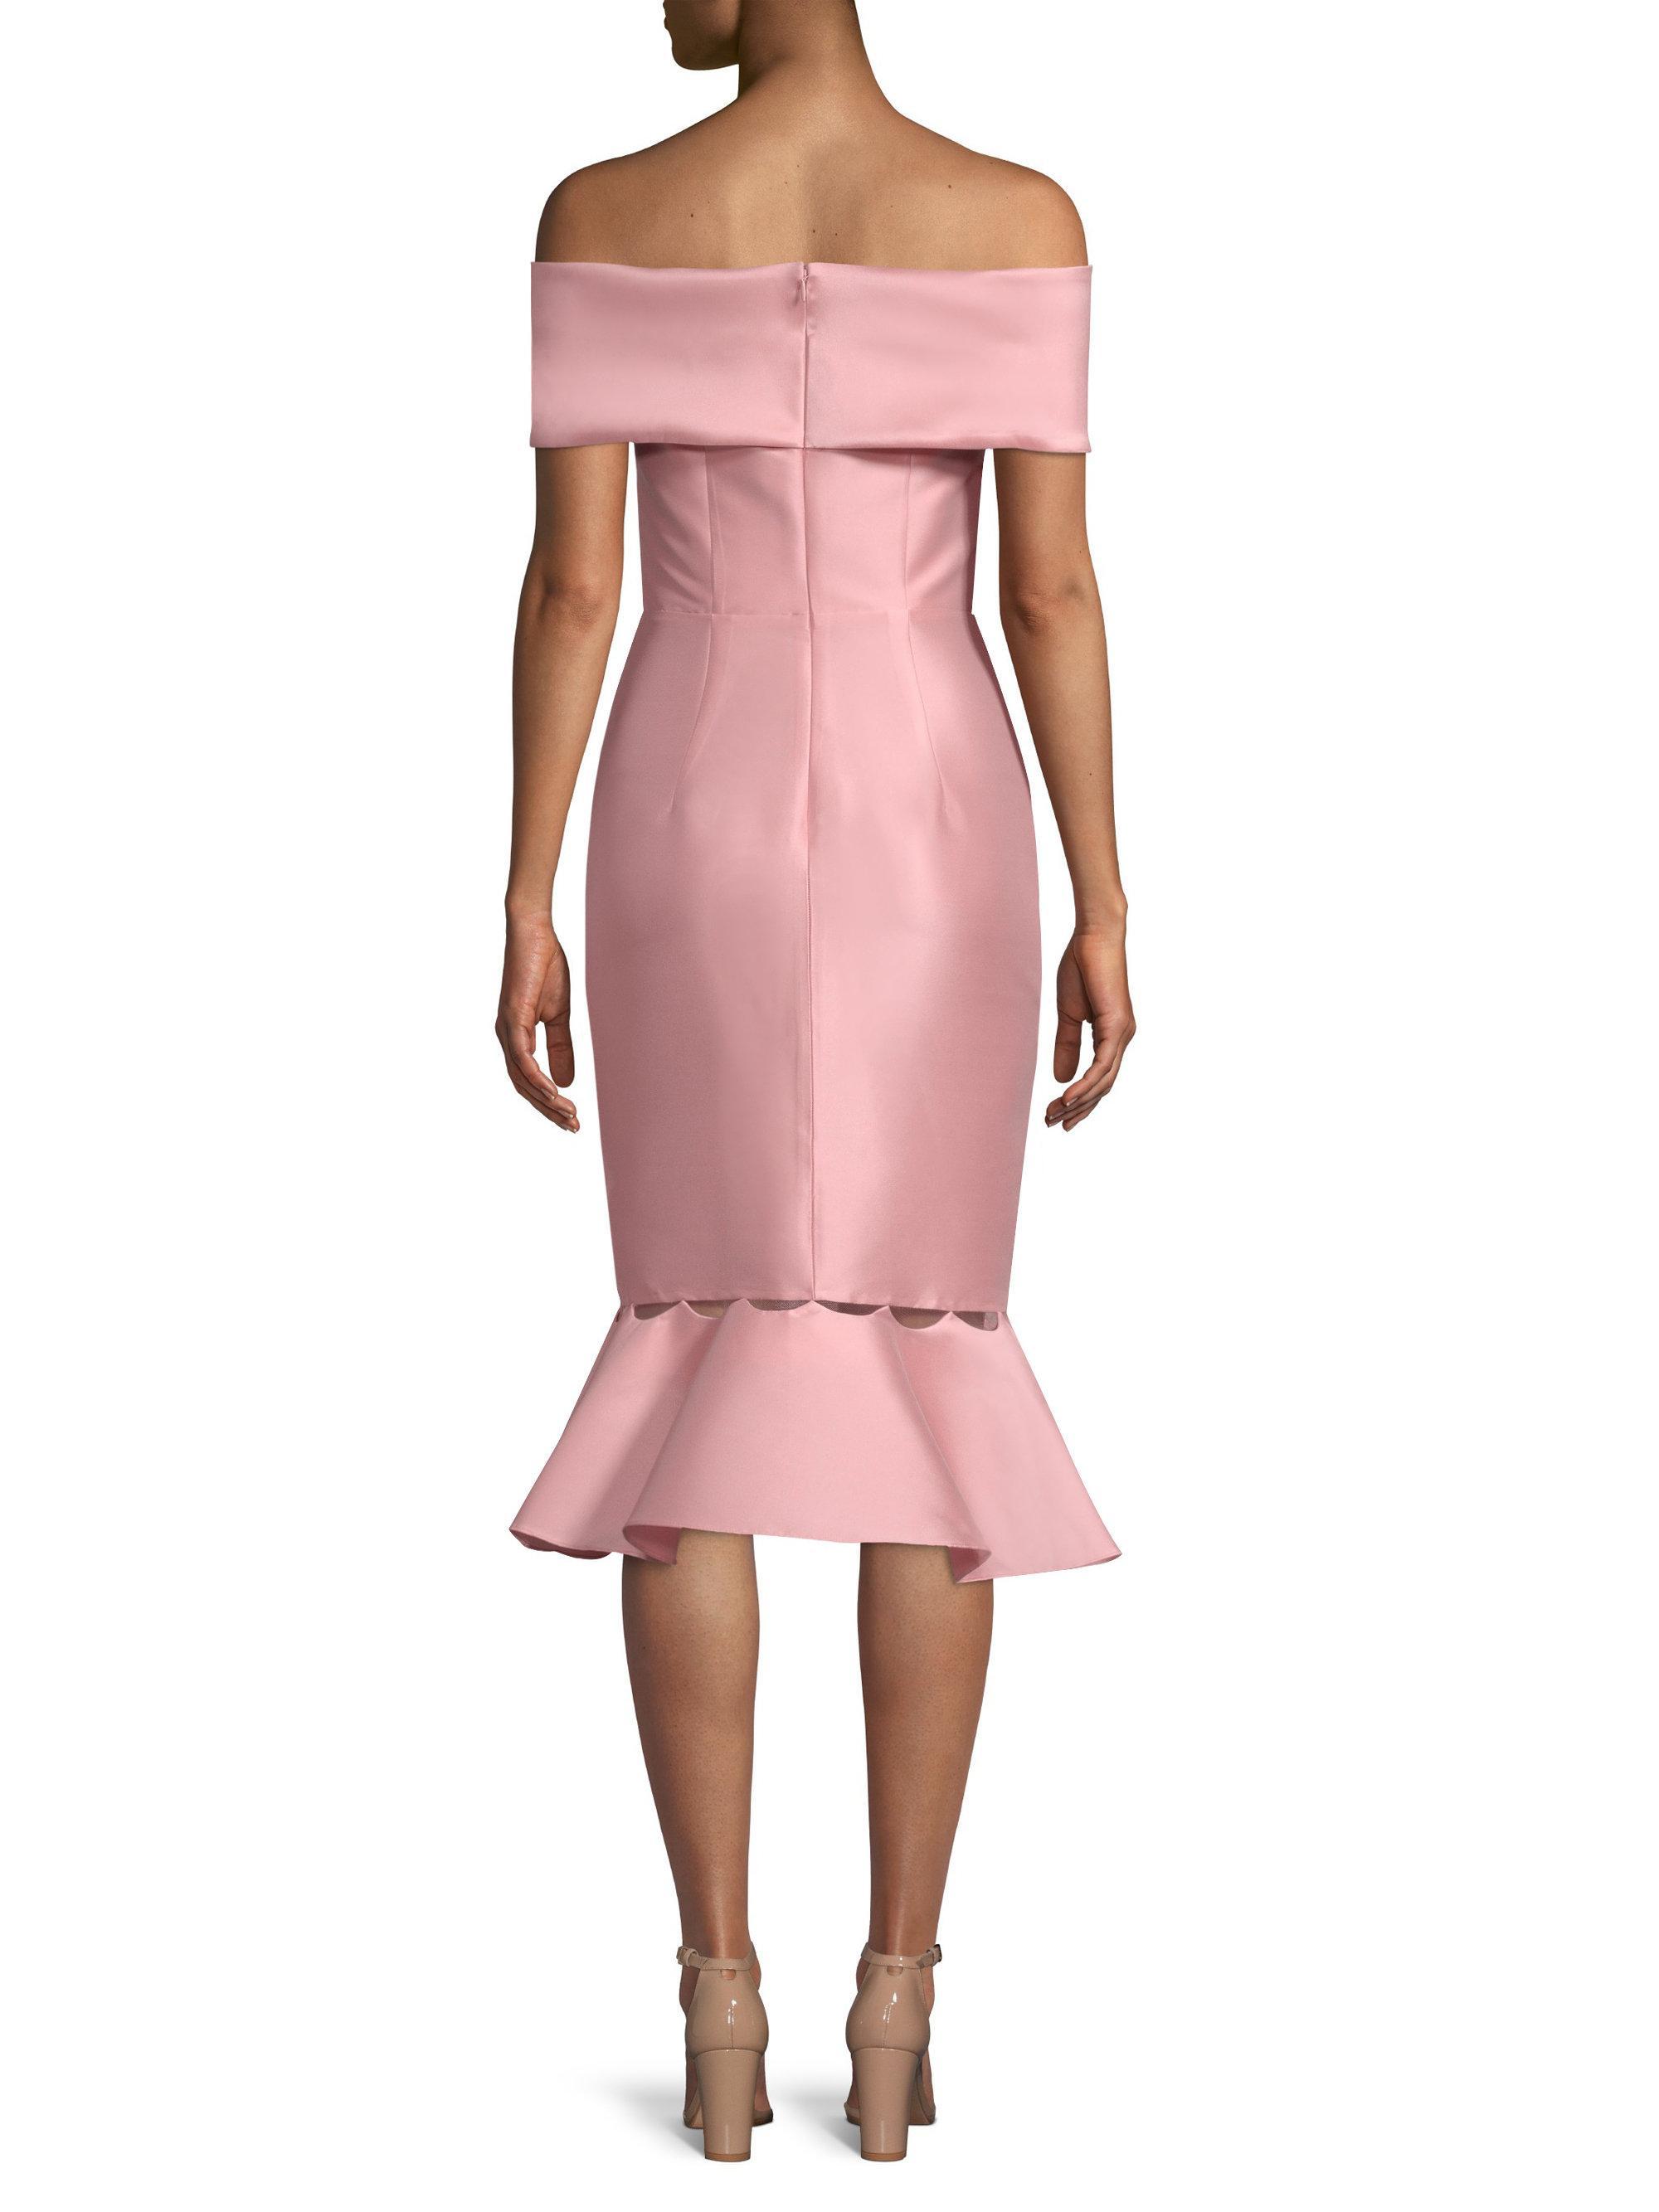 Lyst - Sachin & Babi Hazel Off-shoulder Sheath Dress in Pink